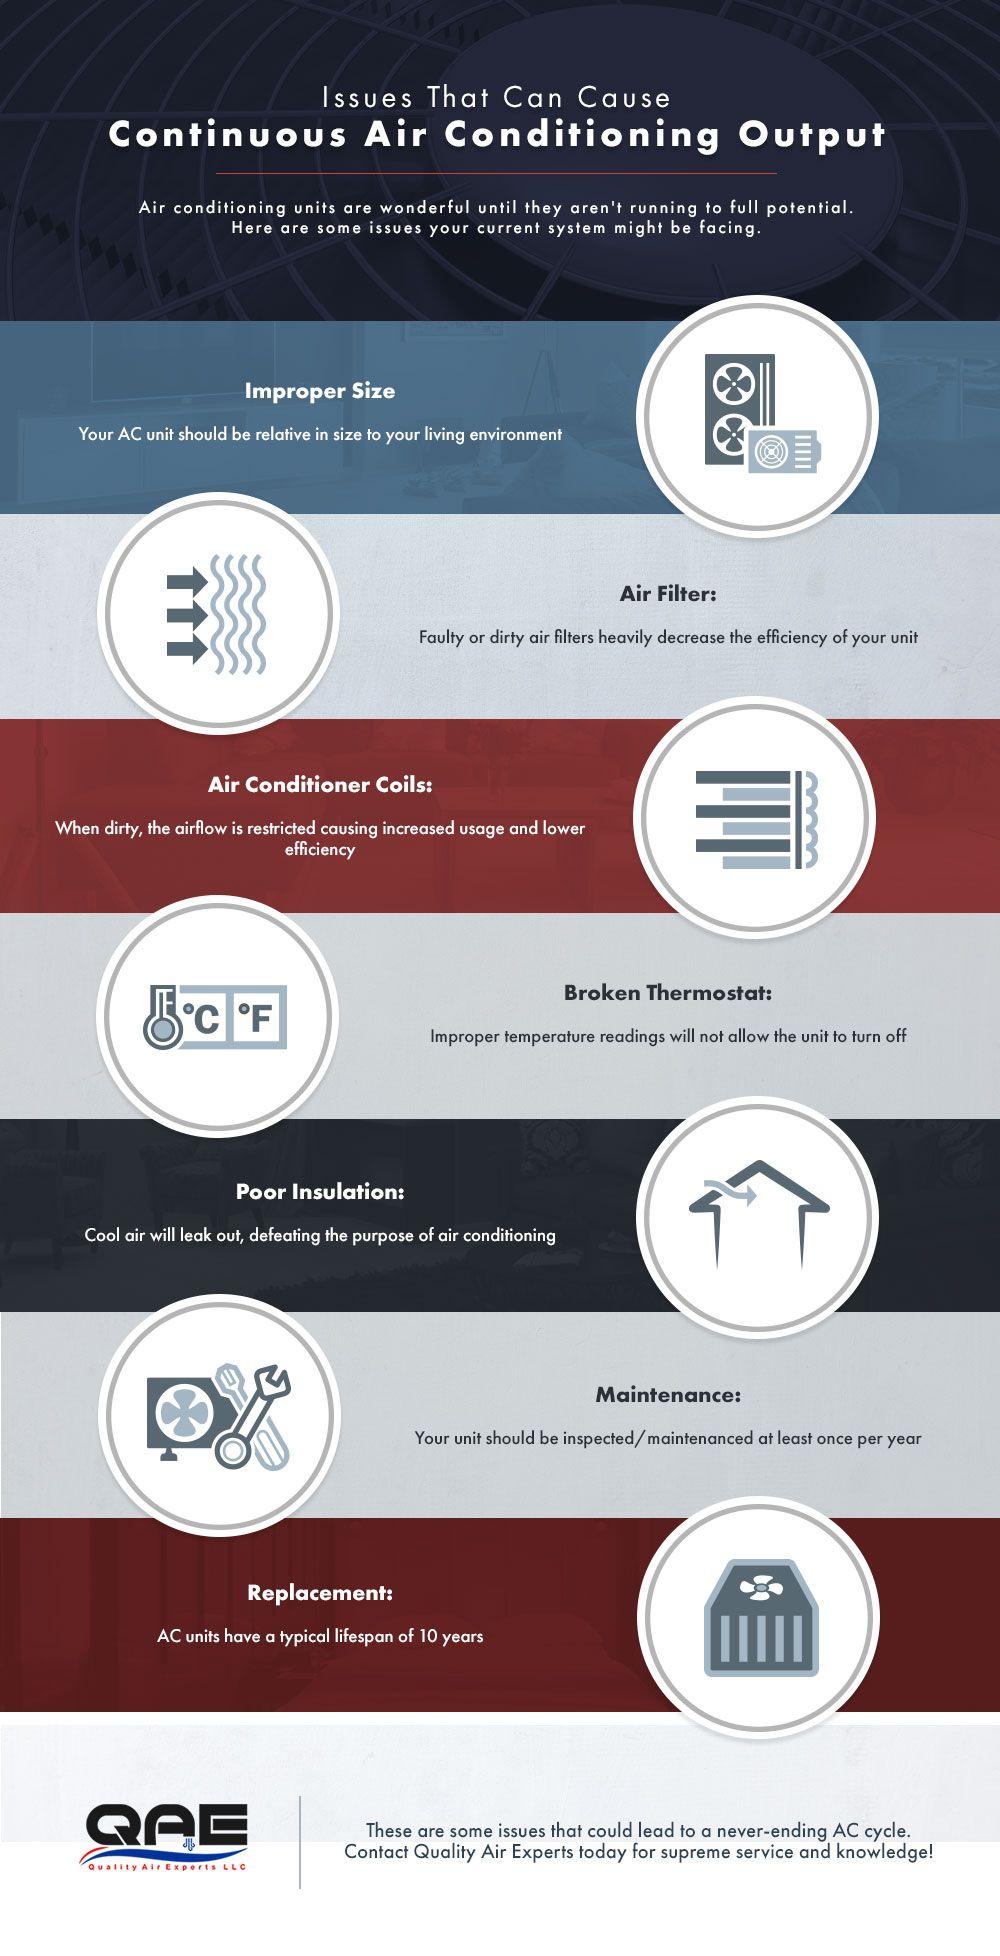 airconditioningissues-infographic.jpg